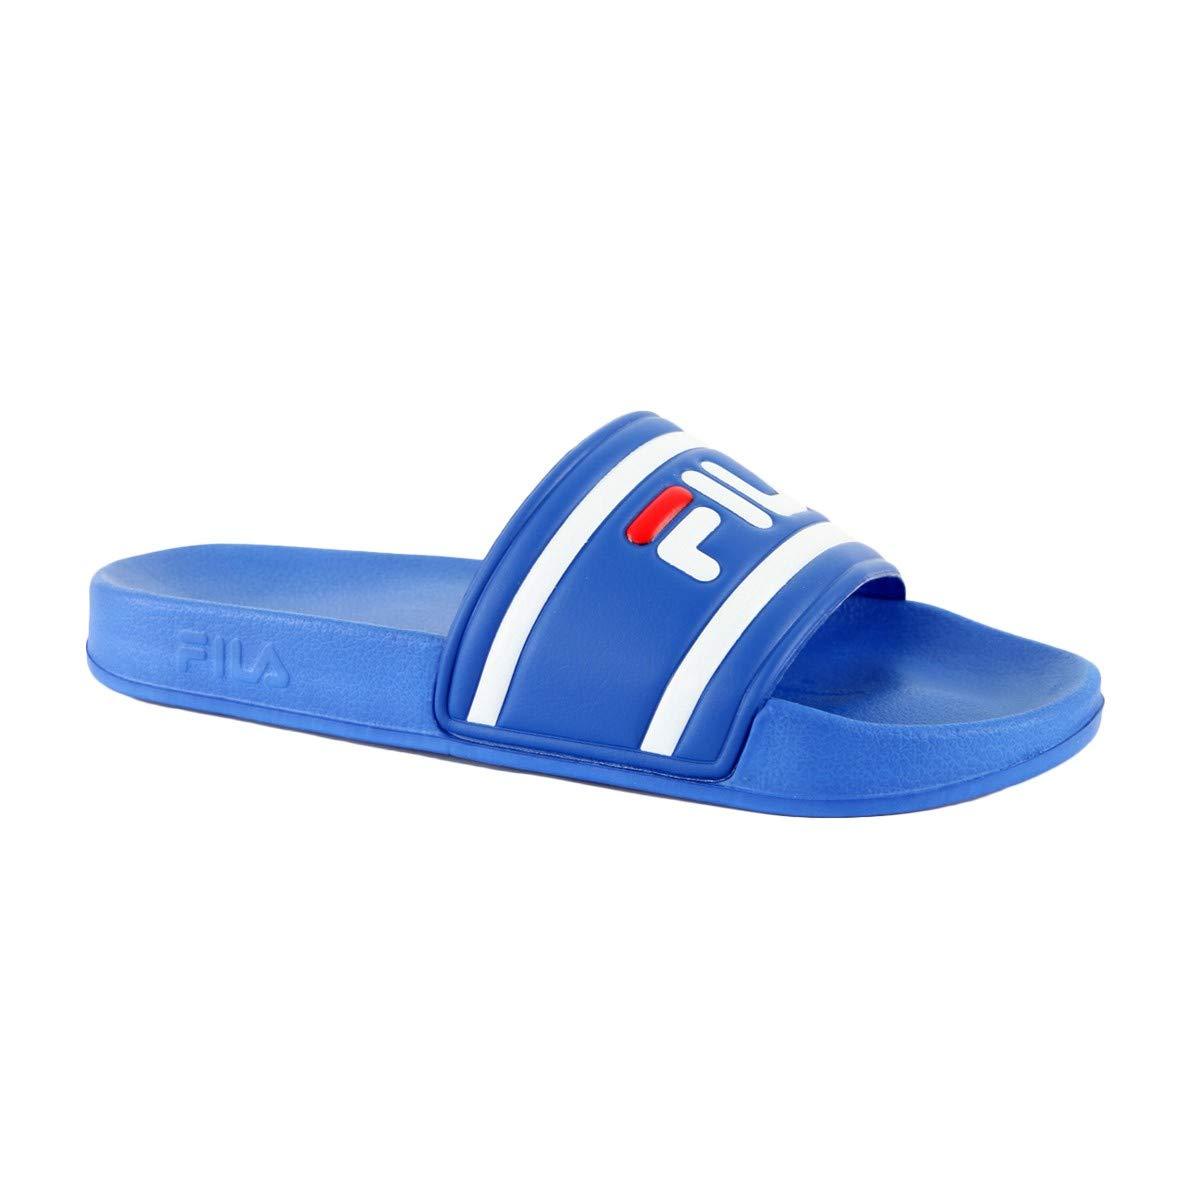 5fcf63bb605878 Sandale Fila Morro Bay Slipper product image